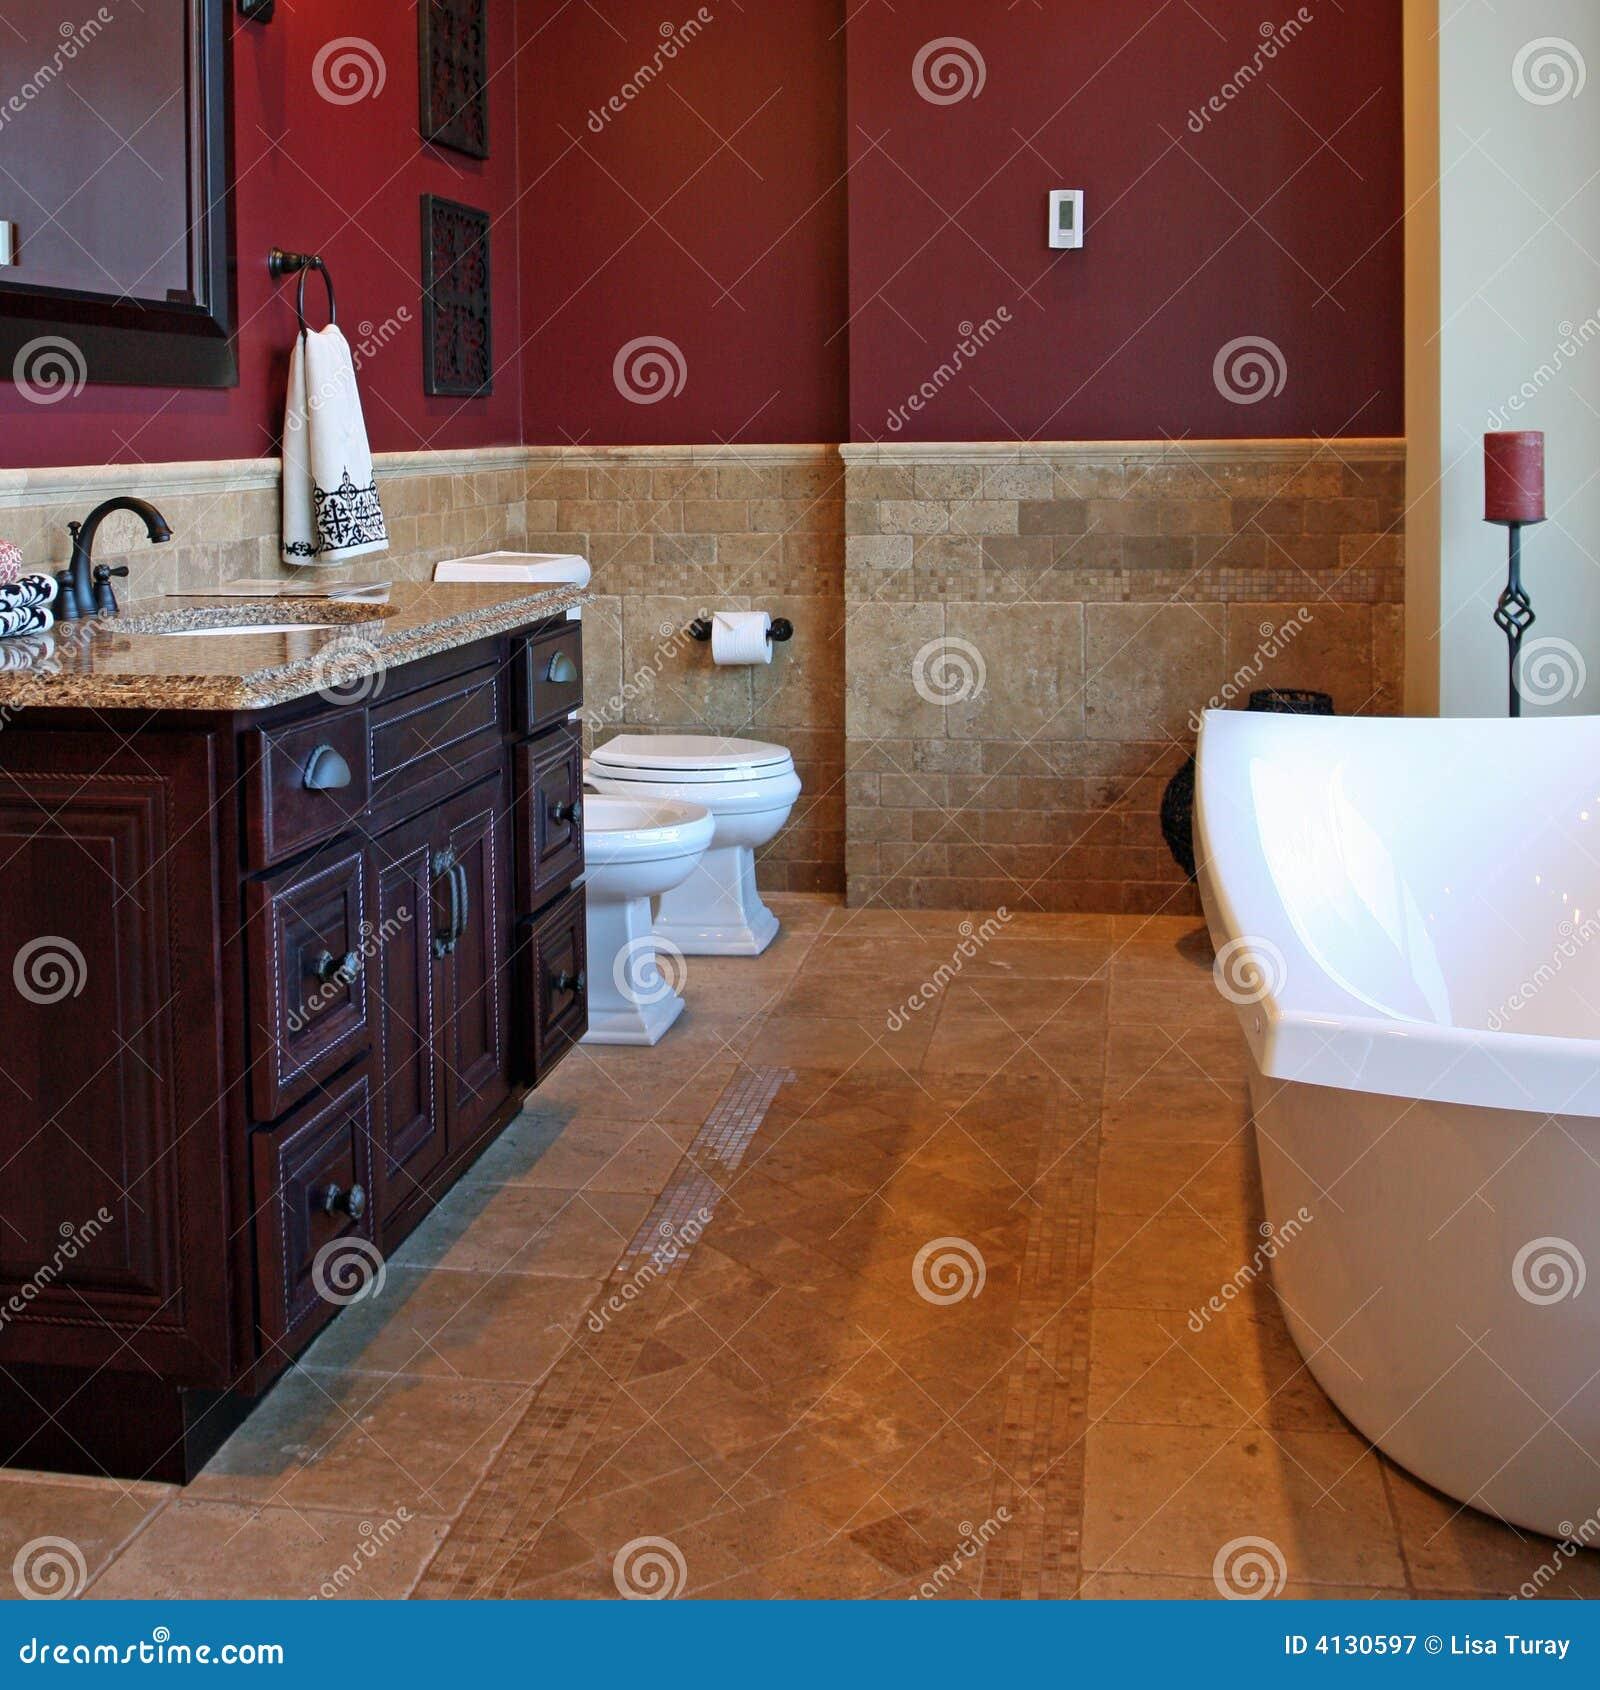 Upscale Bathroom Stock Image. Image Of Decor, Painted